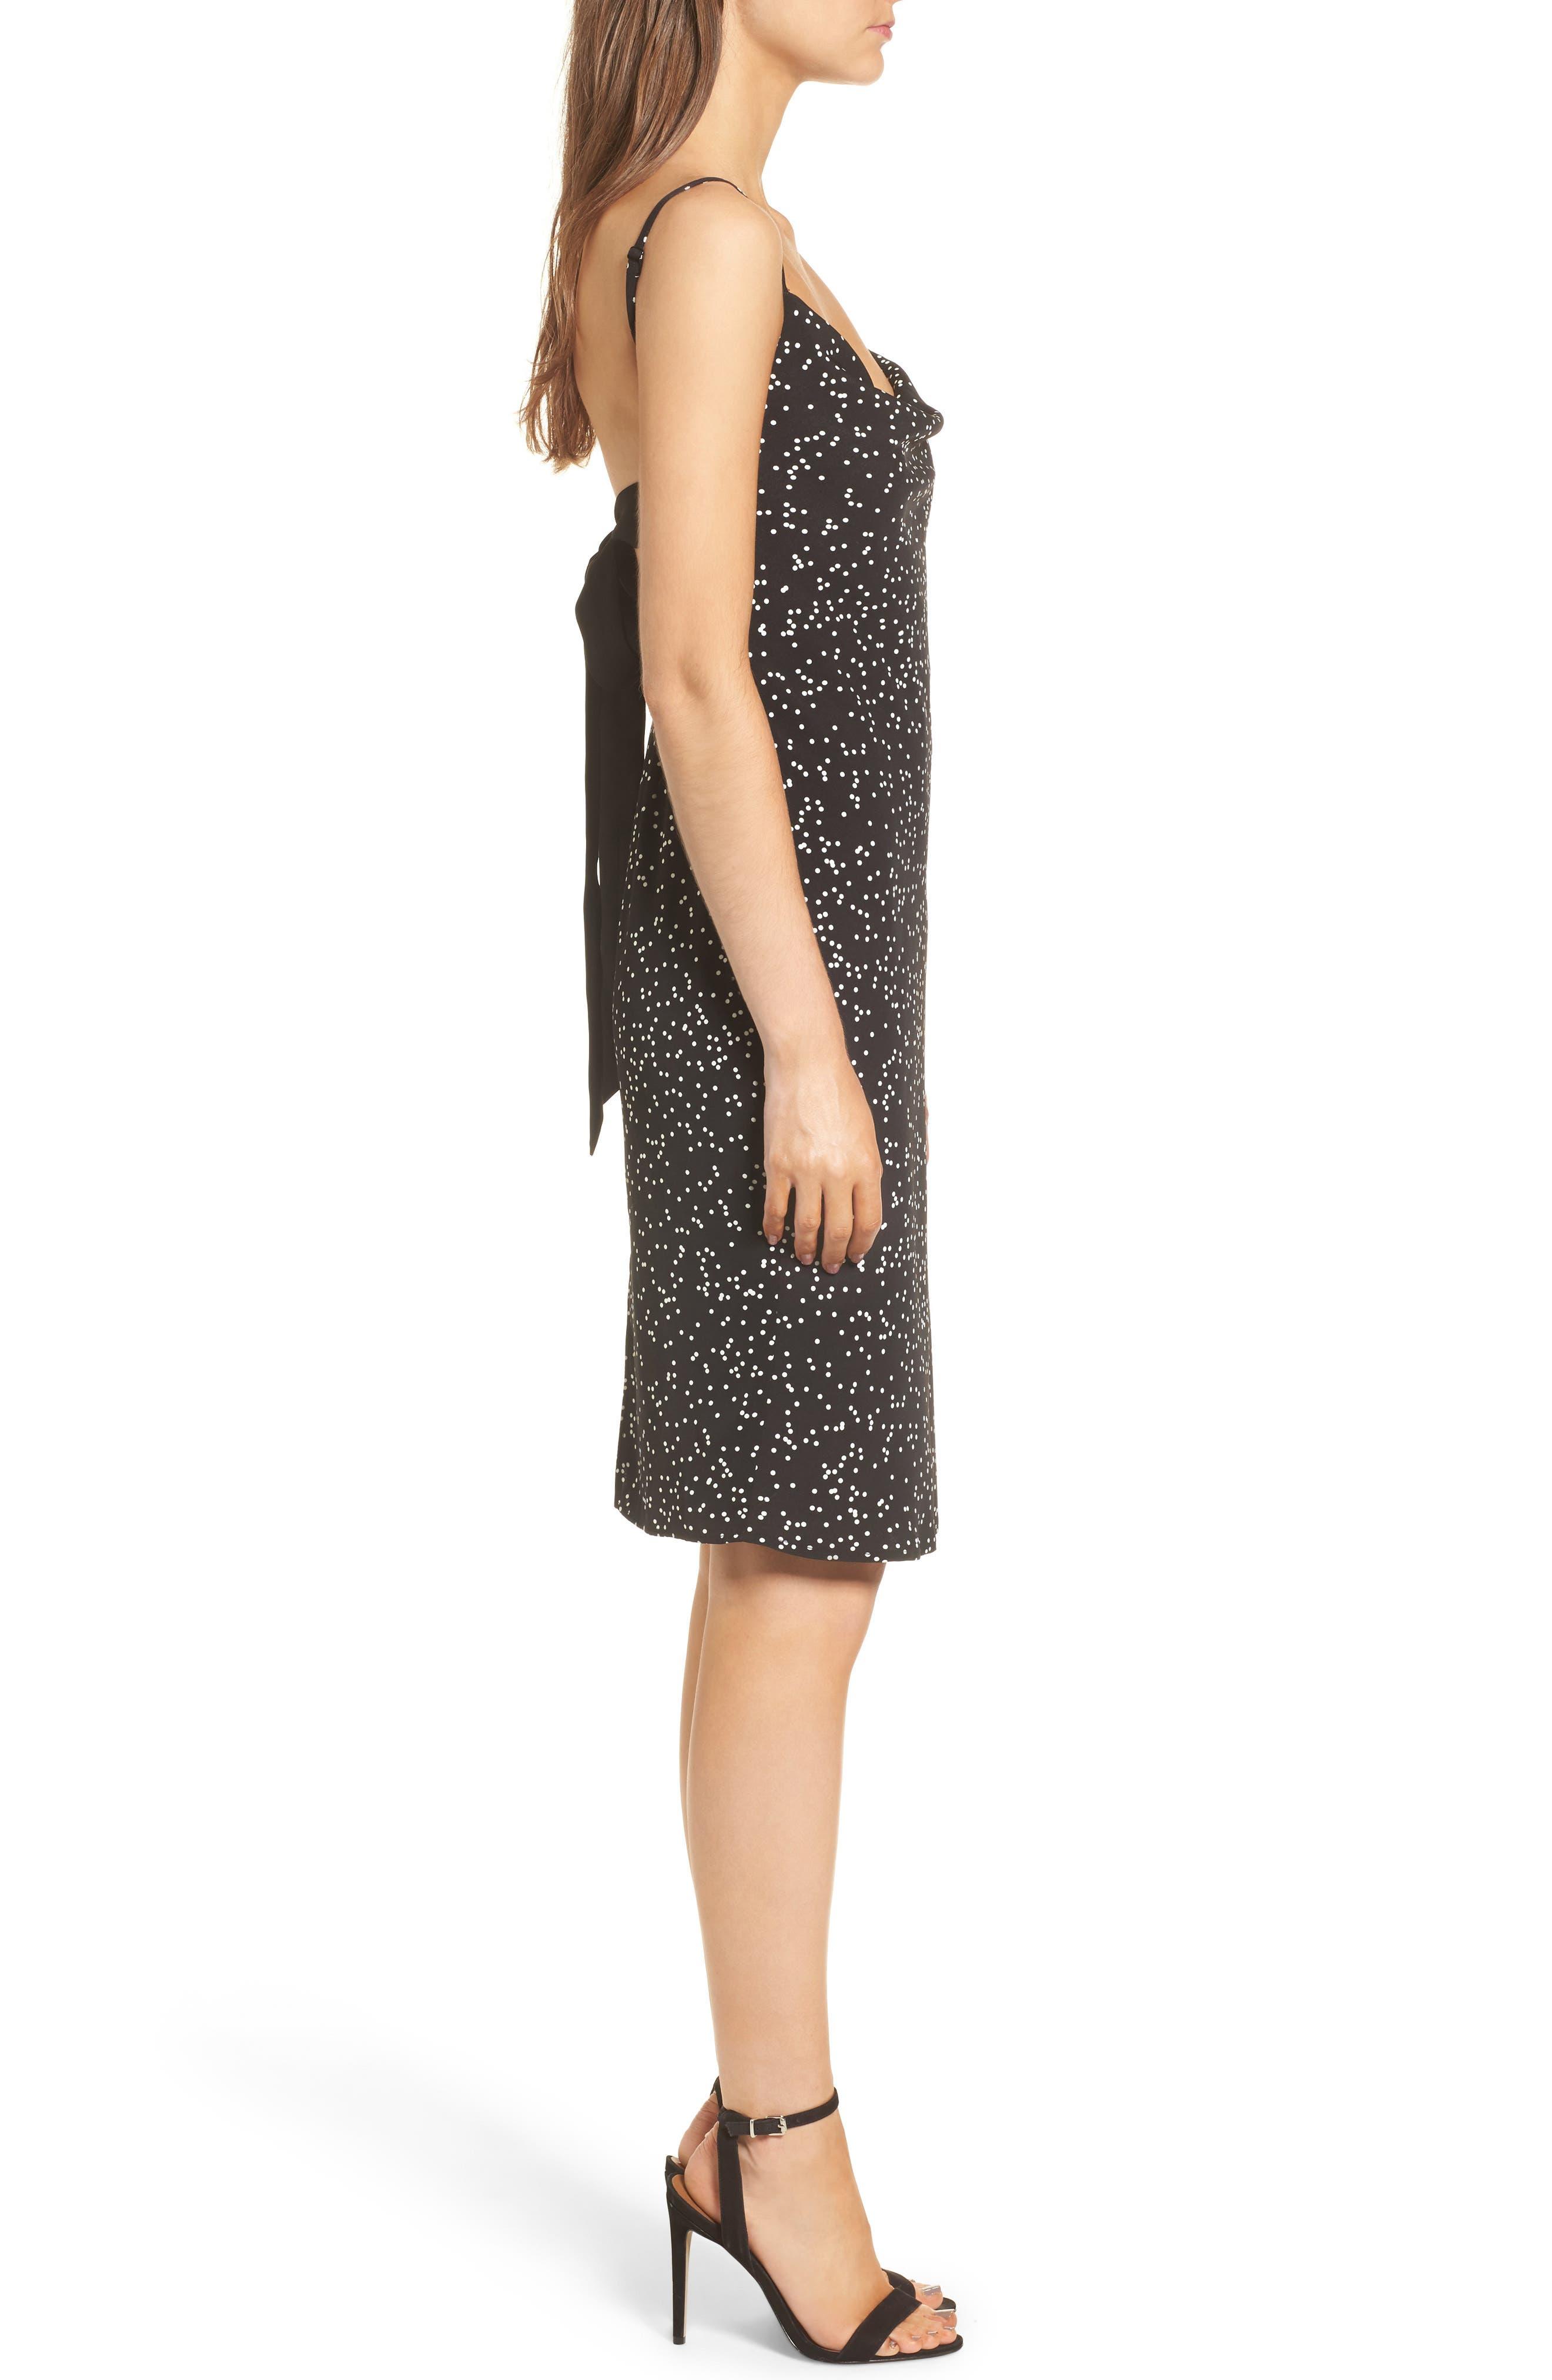 Embrace Me Tie Back Sheath Dress,                             Alternate thumbnail 3, color,                             Black W White Spot